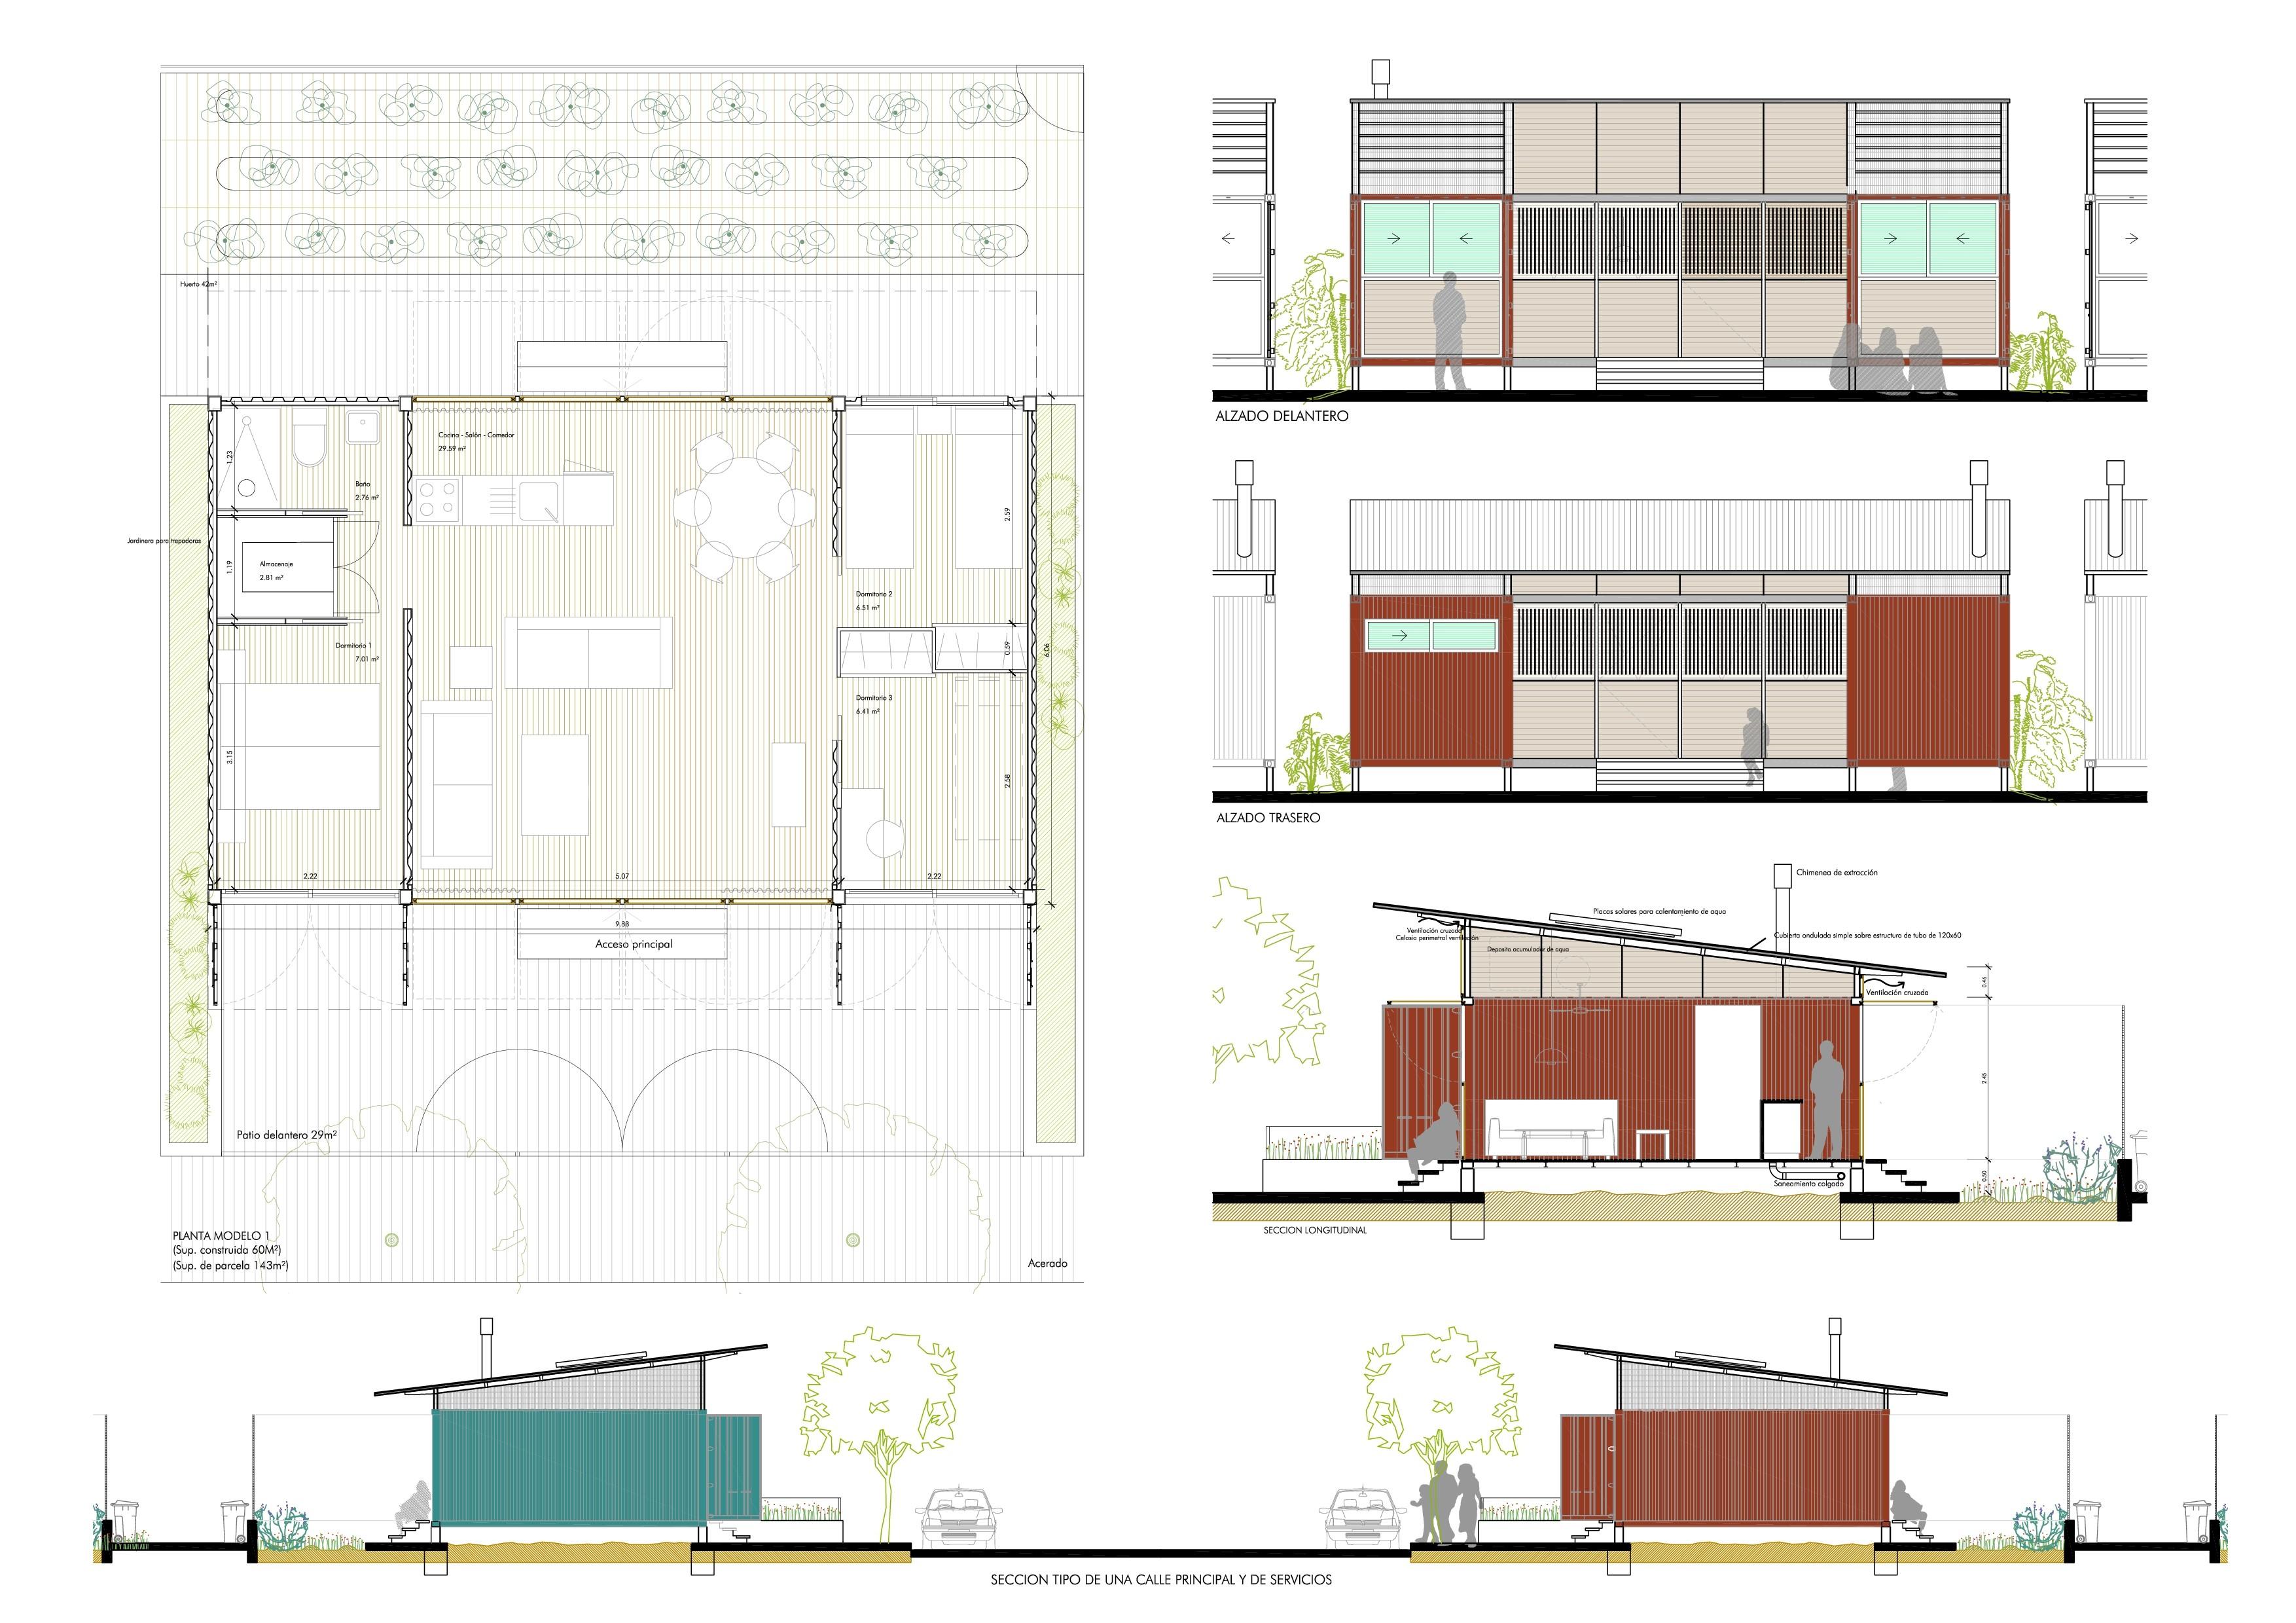 Modulos prefabricados vivienda patio 2 12 vivienda - Modulos de vivienda prefabricados ...